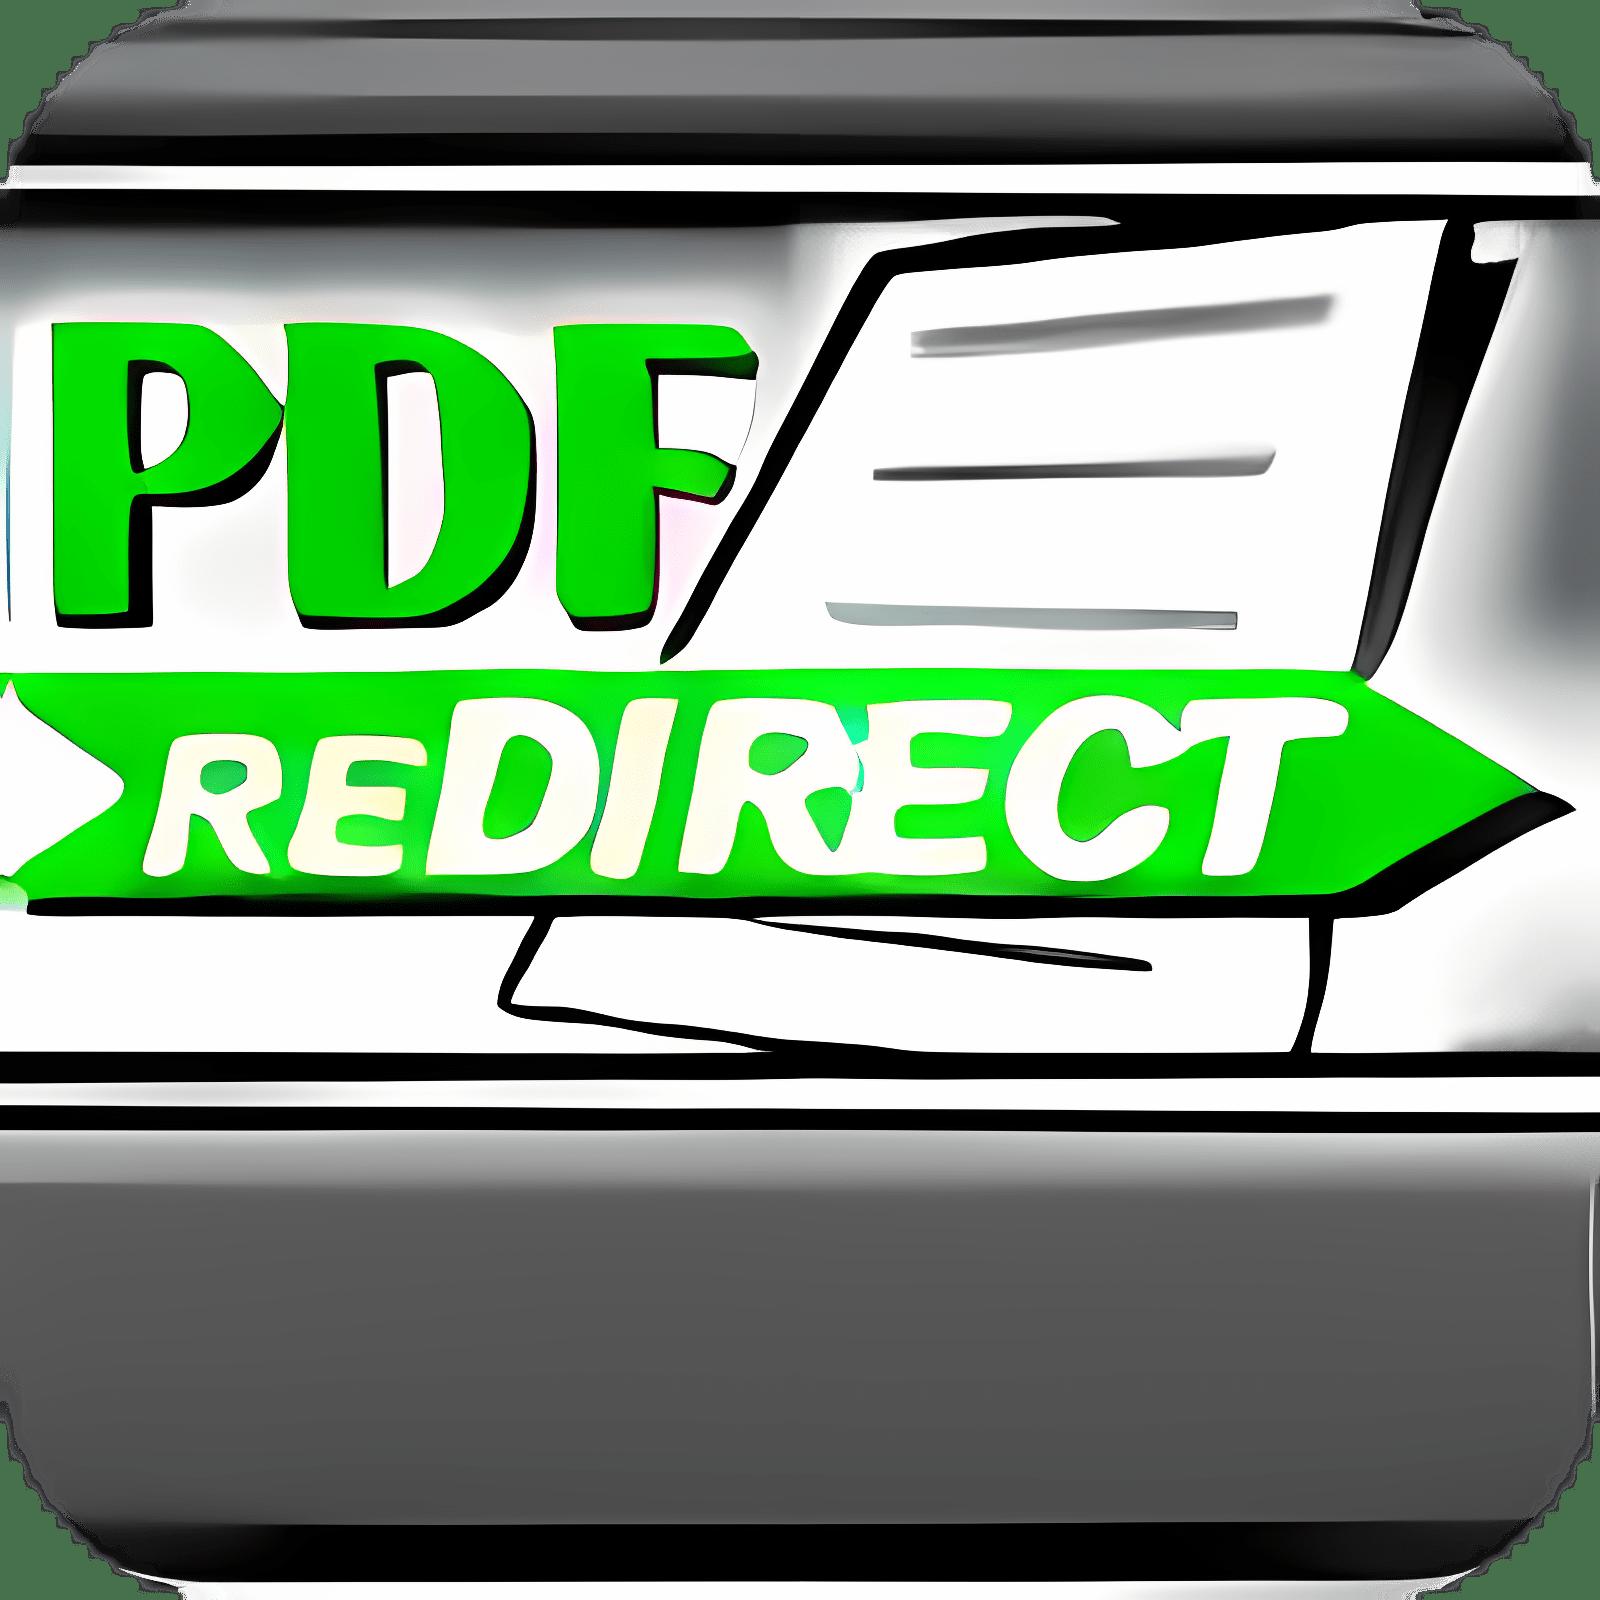 PDF reDirect